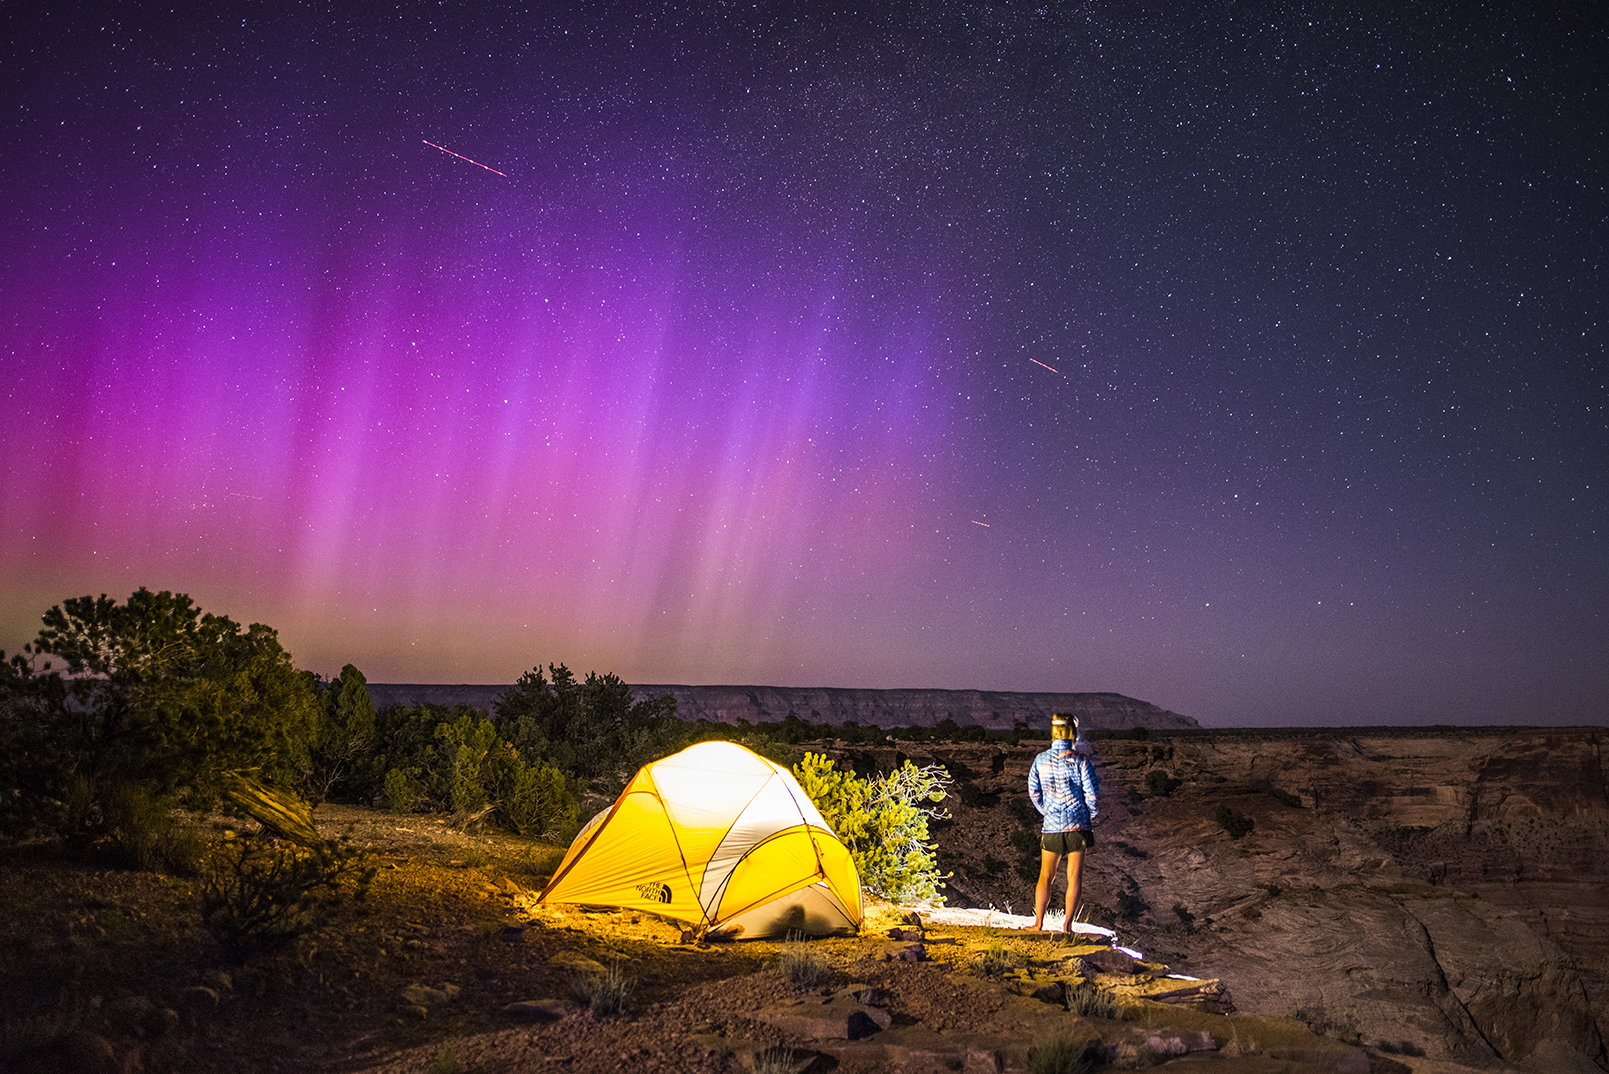 Kaitlyn Farrington. San Rafael Swell, Utah. Photography by Tim Kemple.